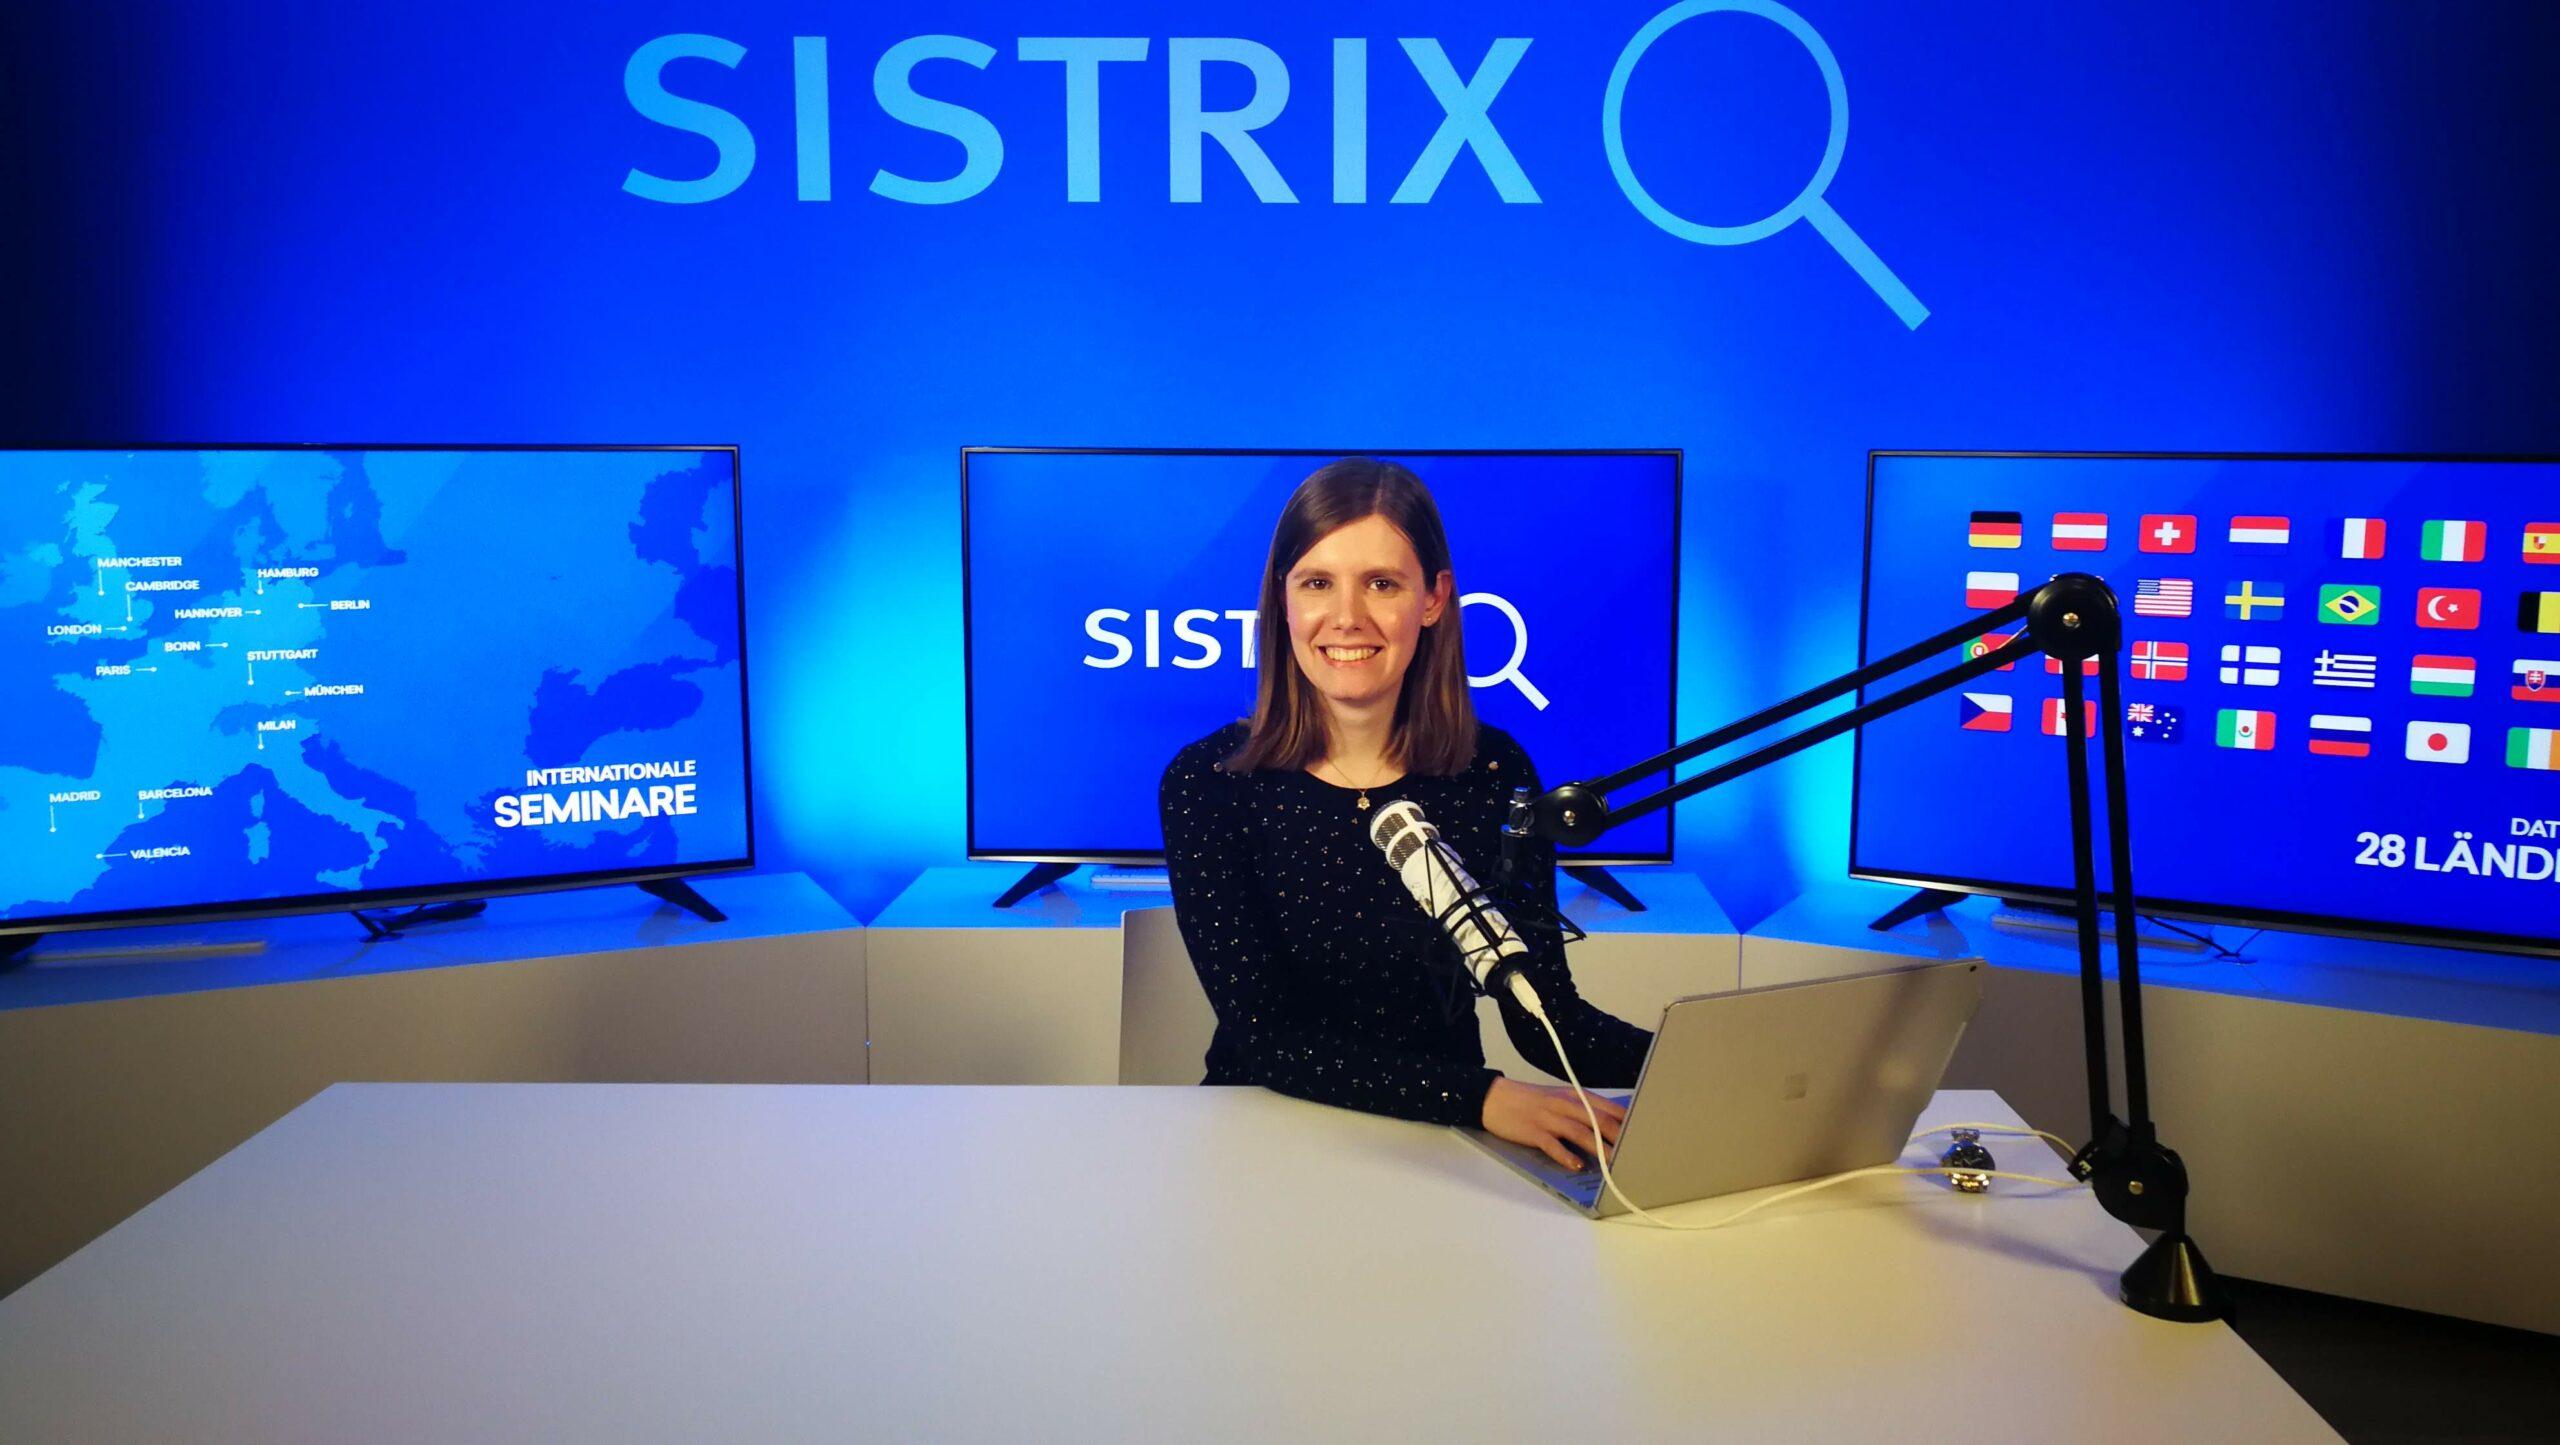 SISTRIX TV studio